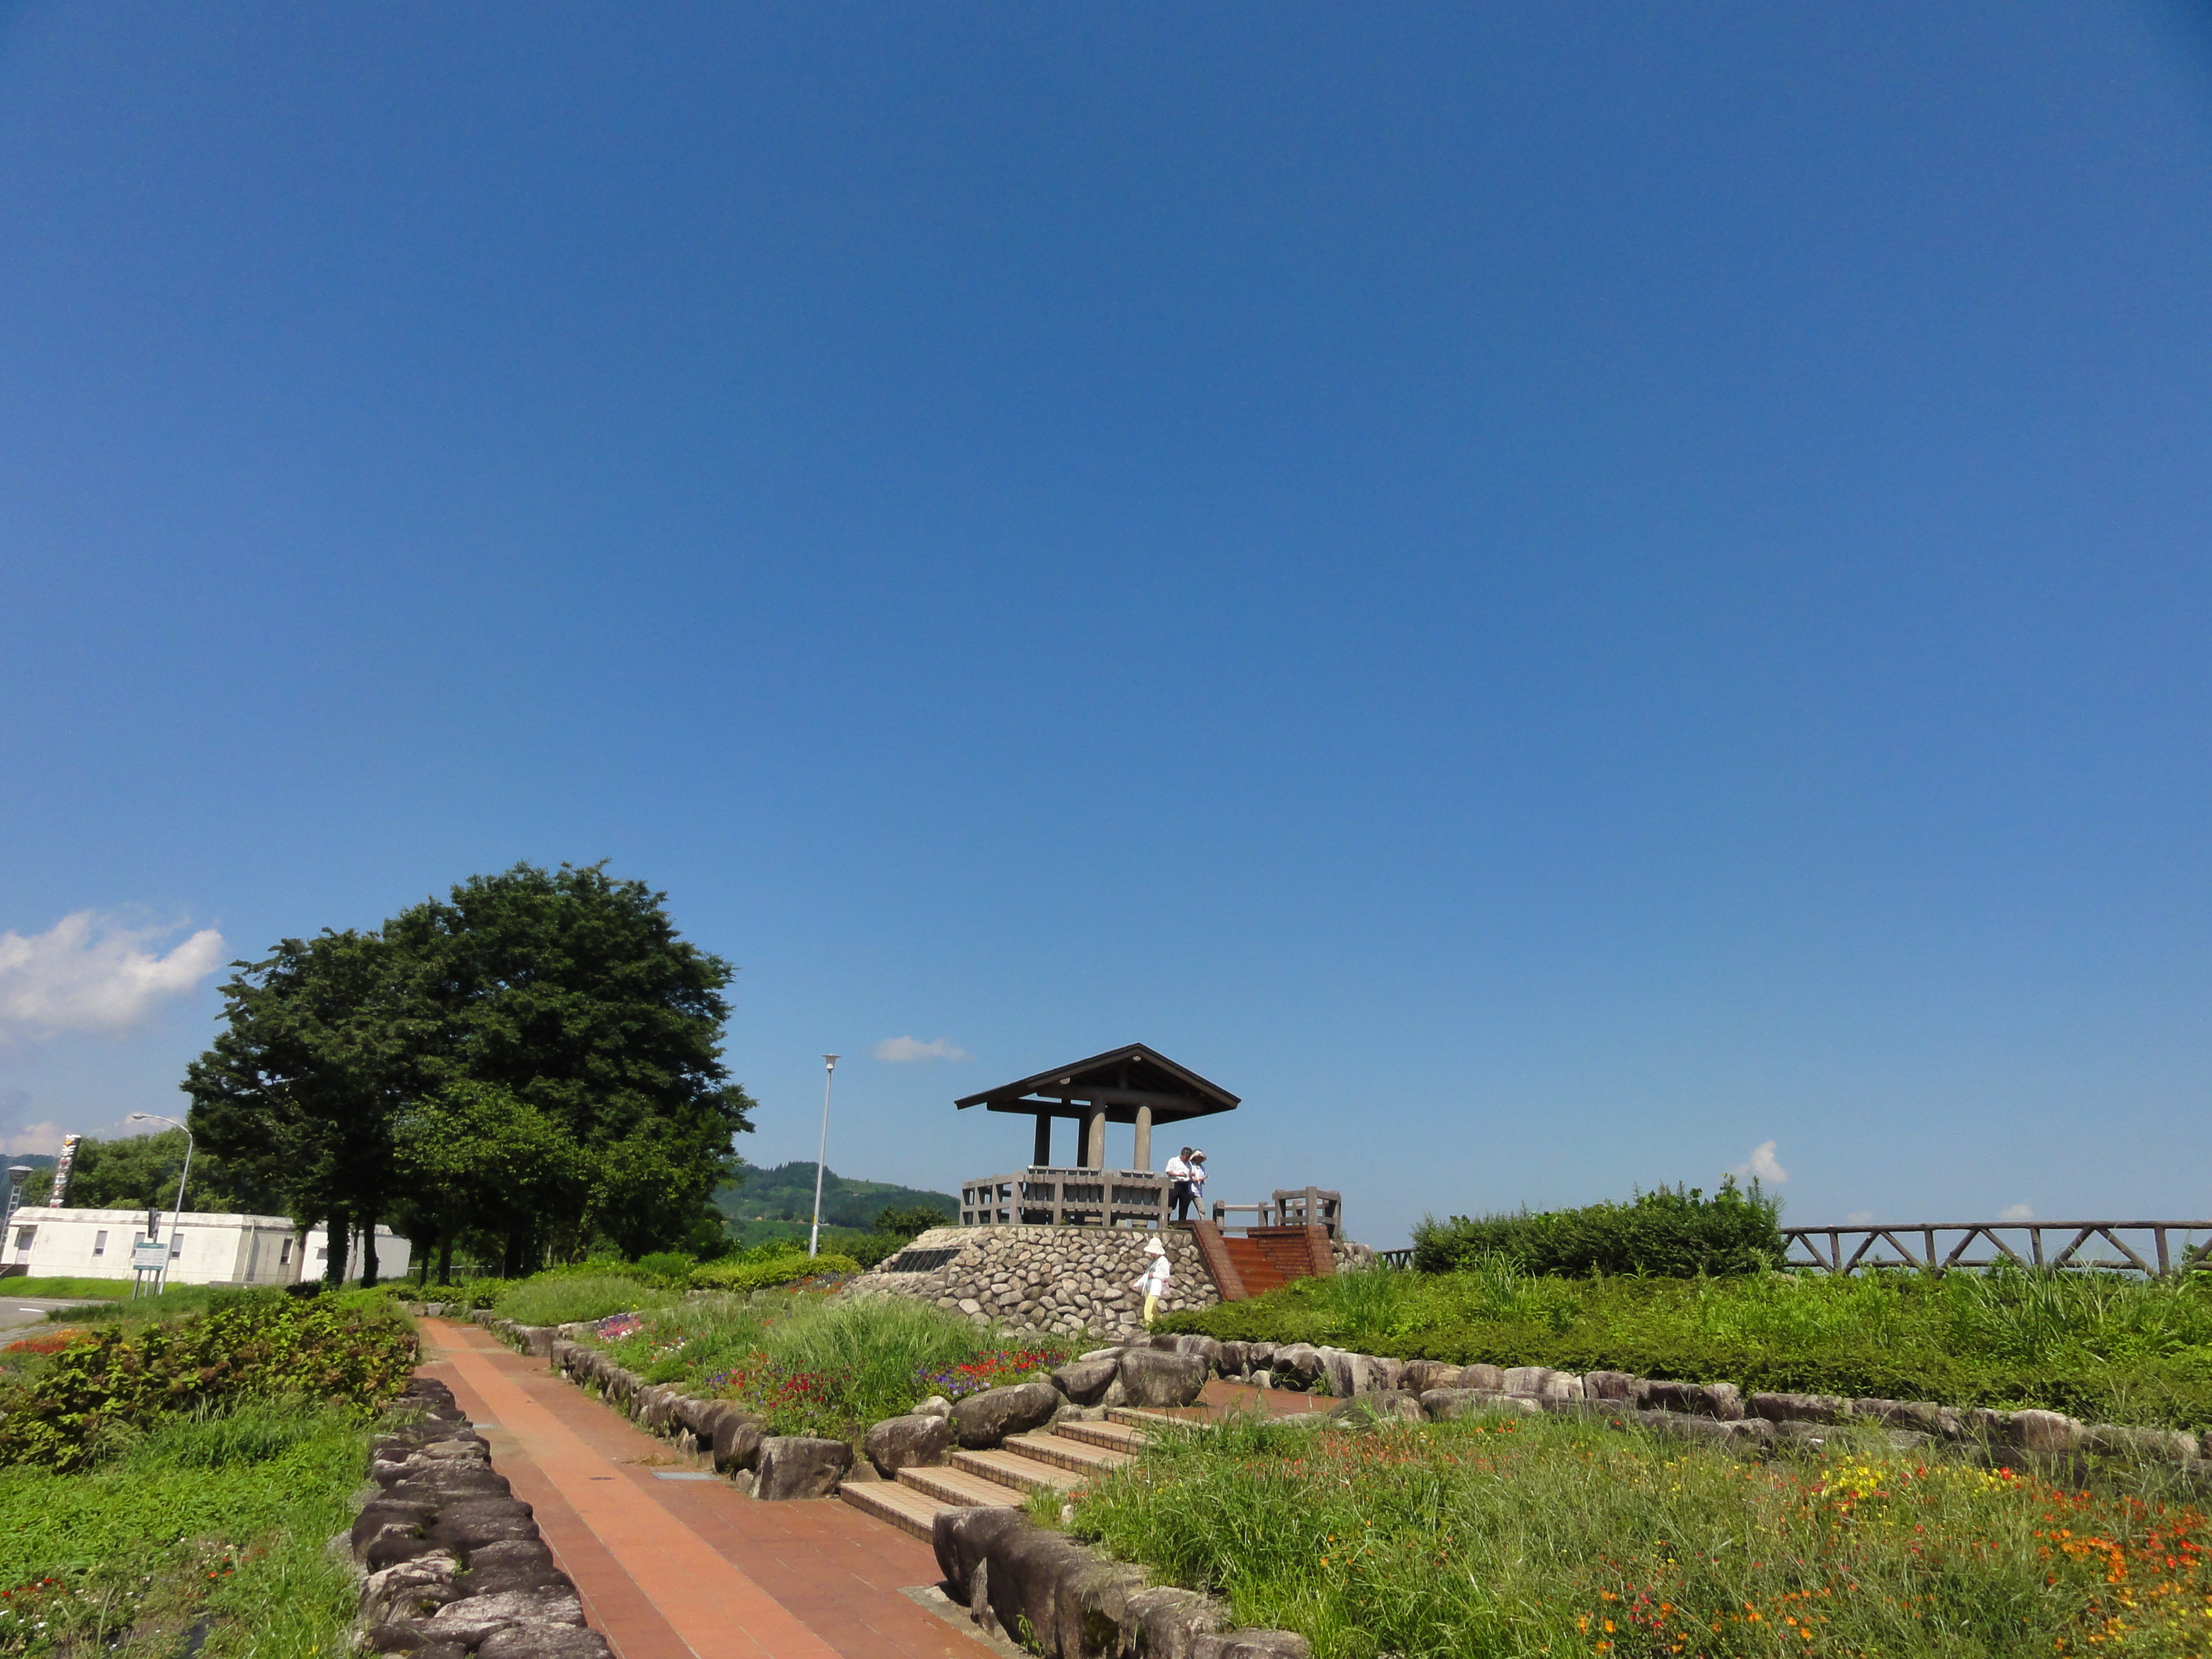 20140822-kawaguchi.jpg